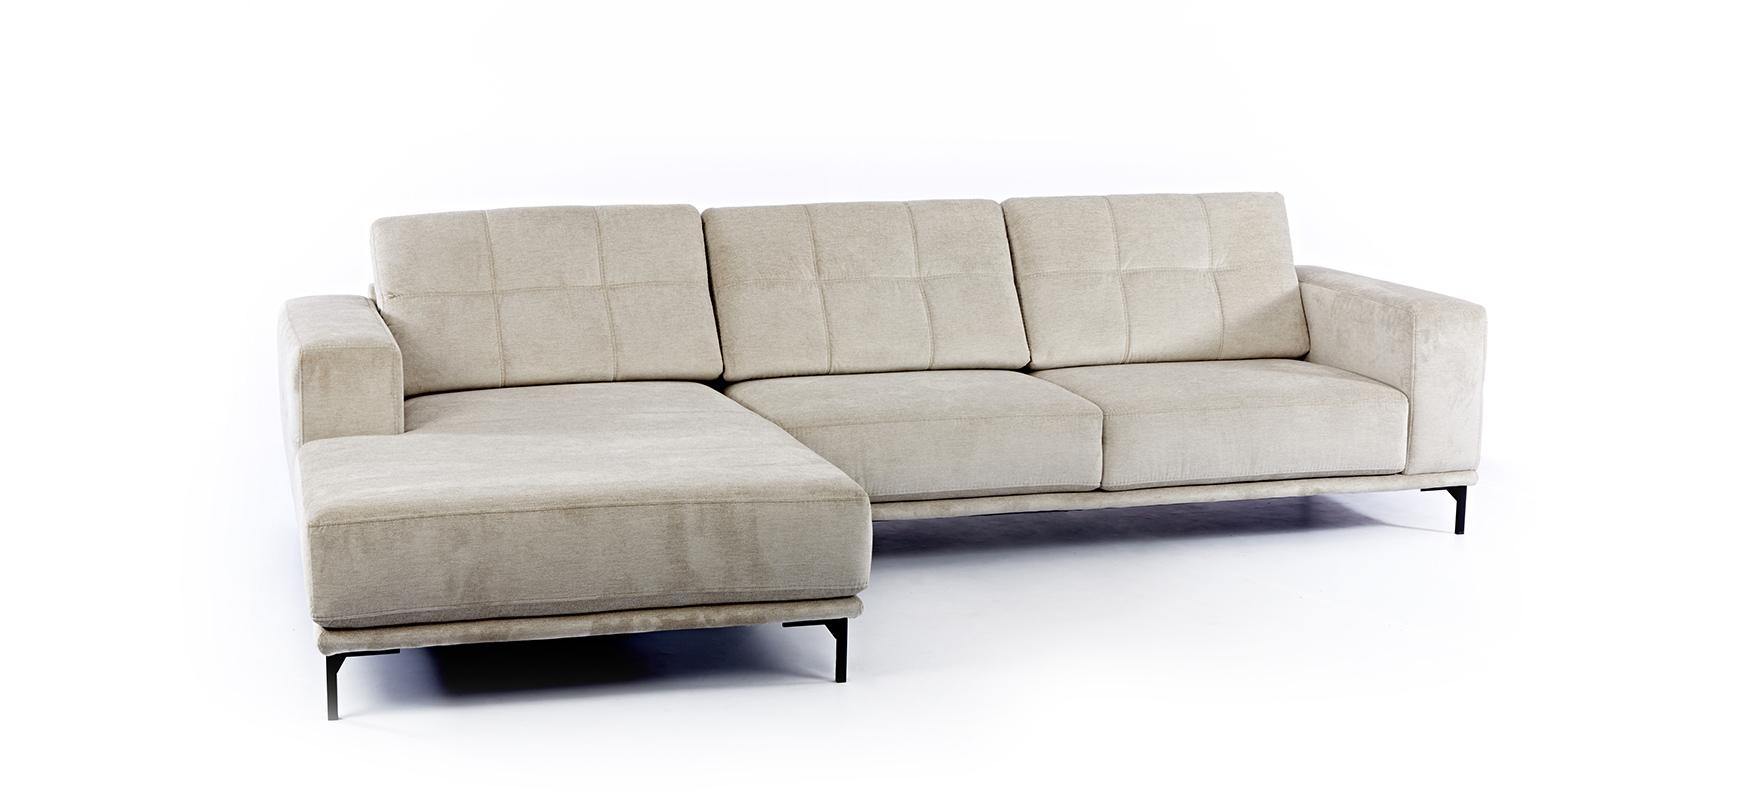 Hayden-Couch-Thumbnail